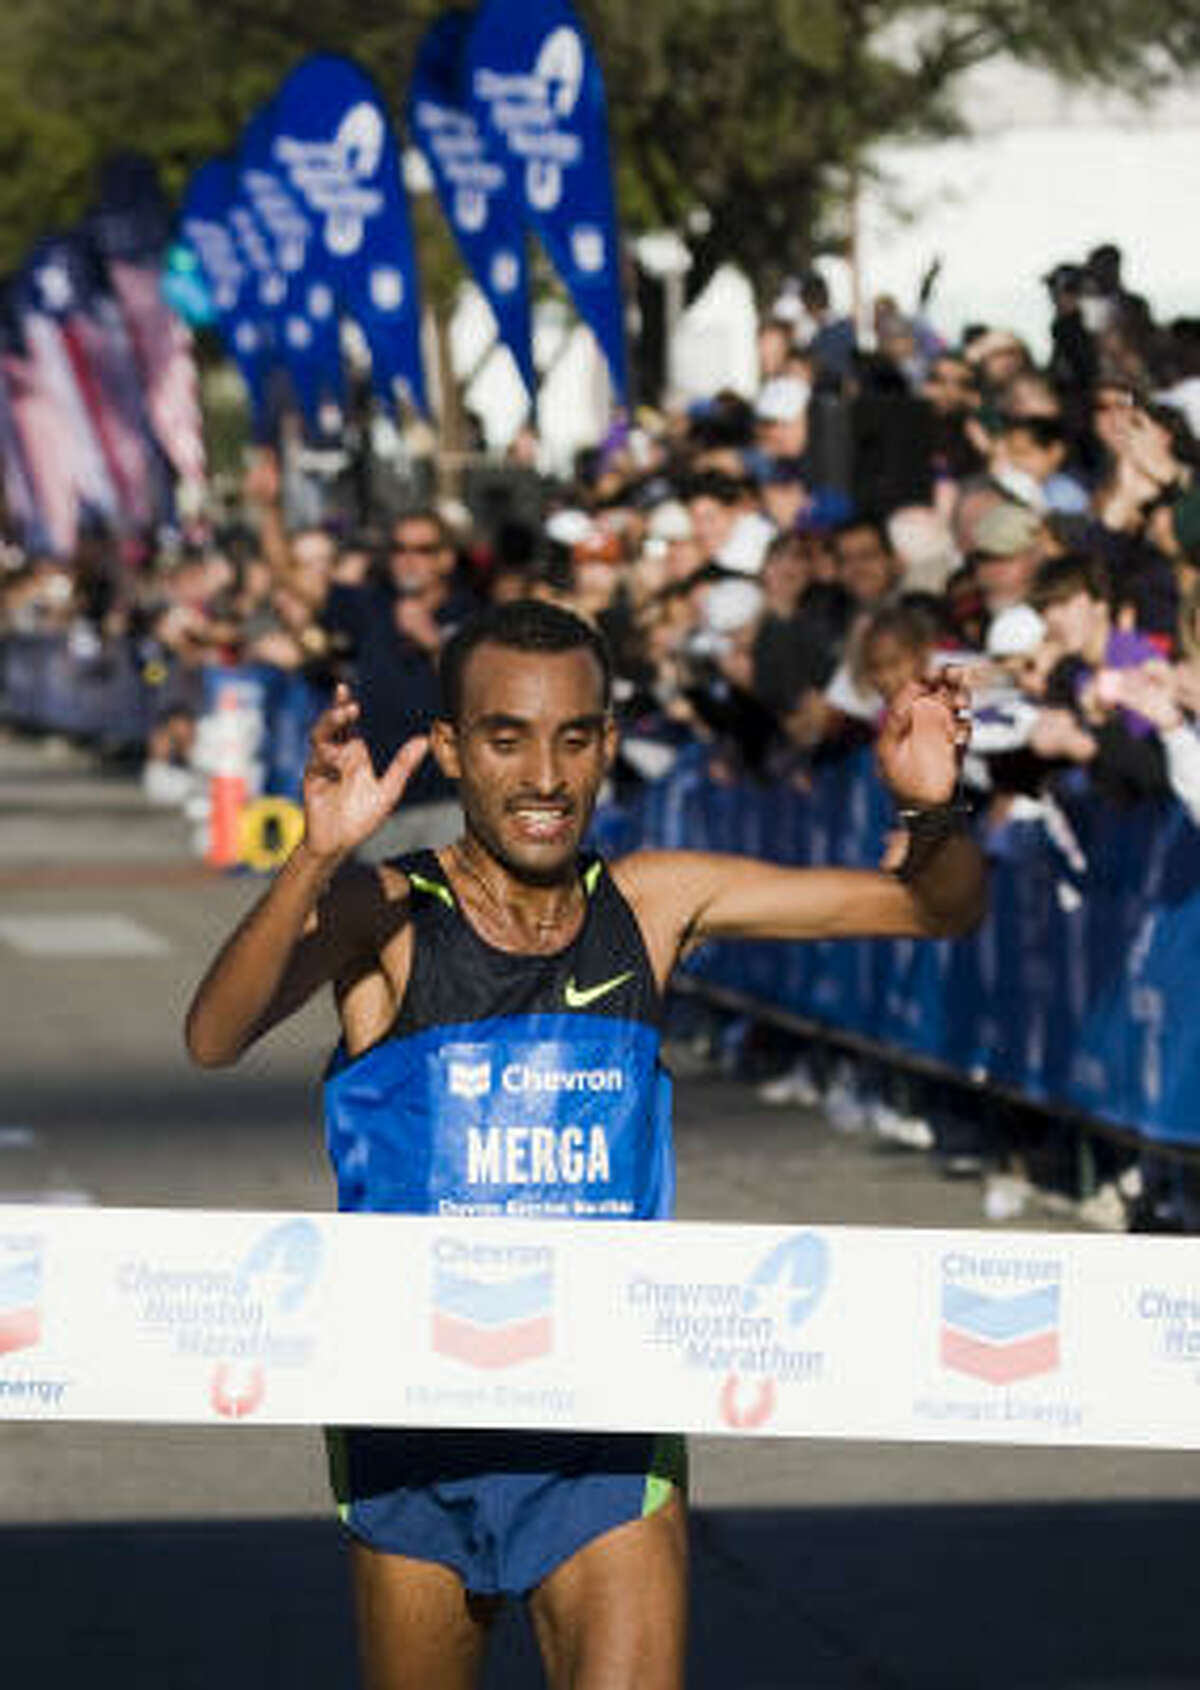 Deriba Merga of Ethiopia crosses the finish line to win the 2009 Chevron Houston Marathon with a course record time of 2:07:52.